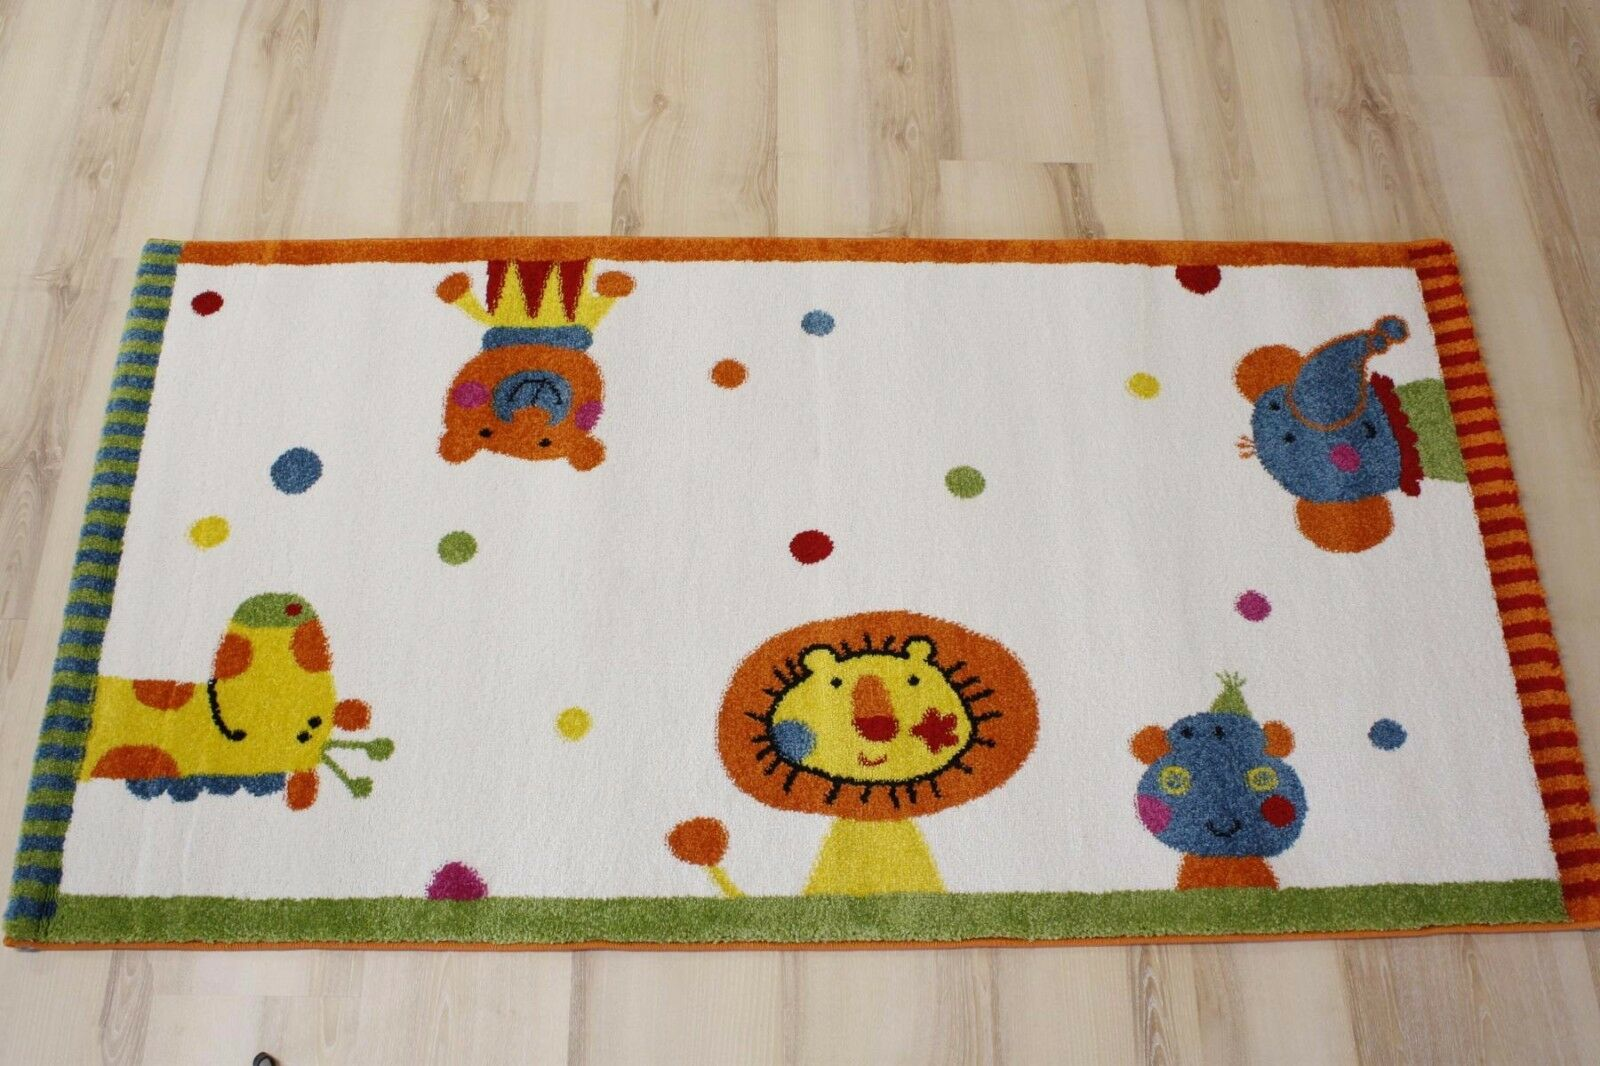 Enfants tapis jeu tapis sigikid sk-0525-01 Animal Festival 200x290 cm multiCouleures